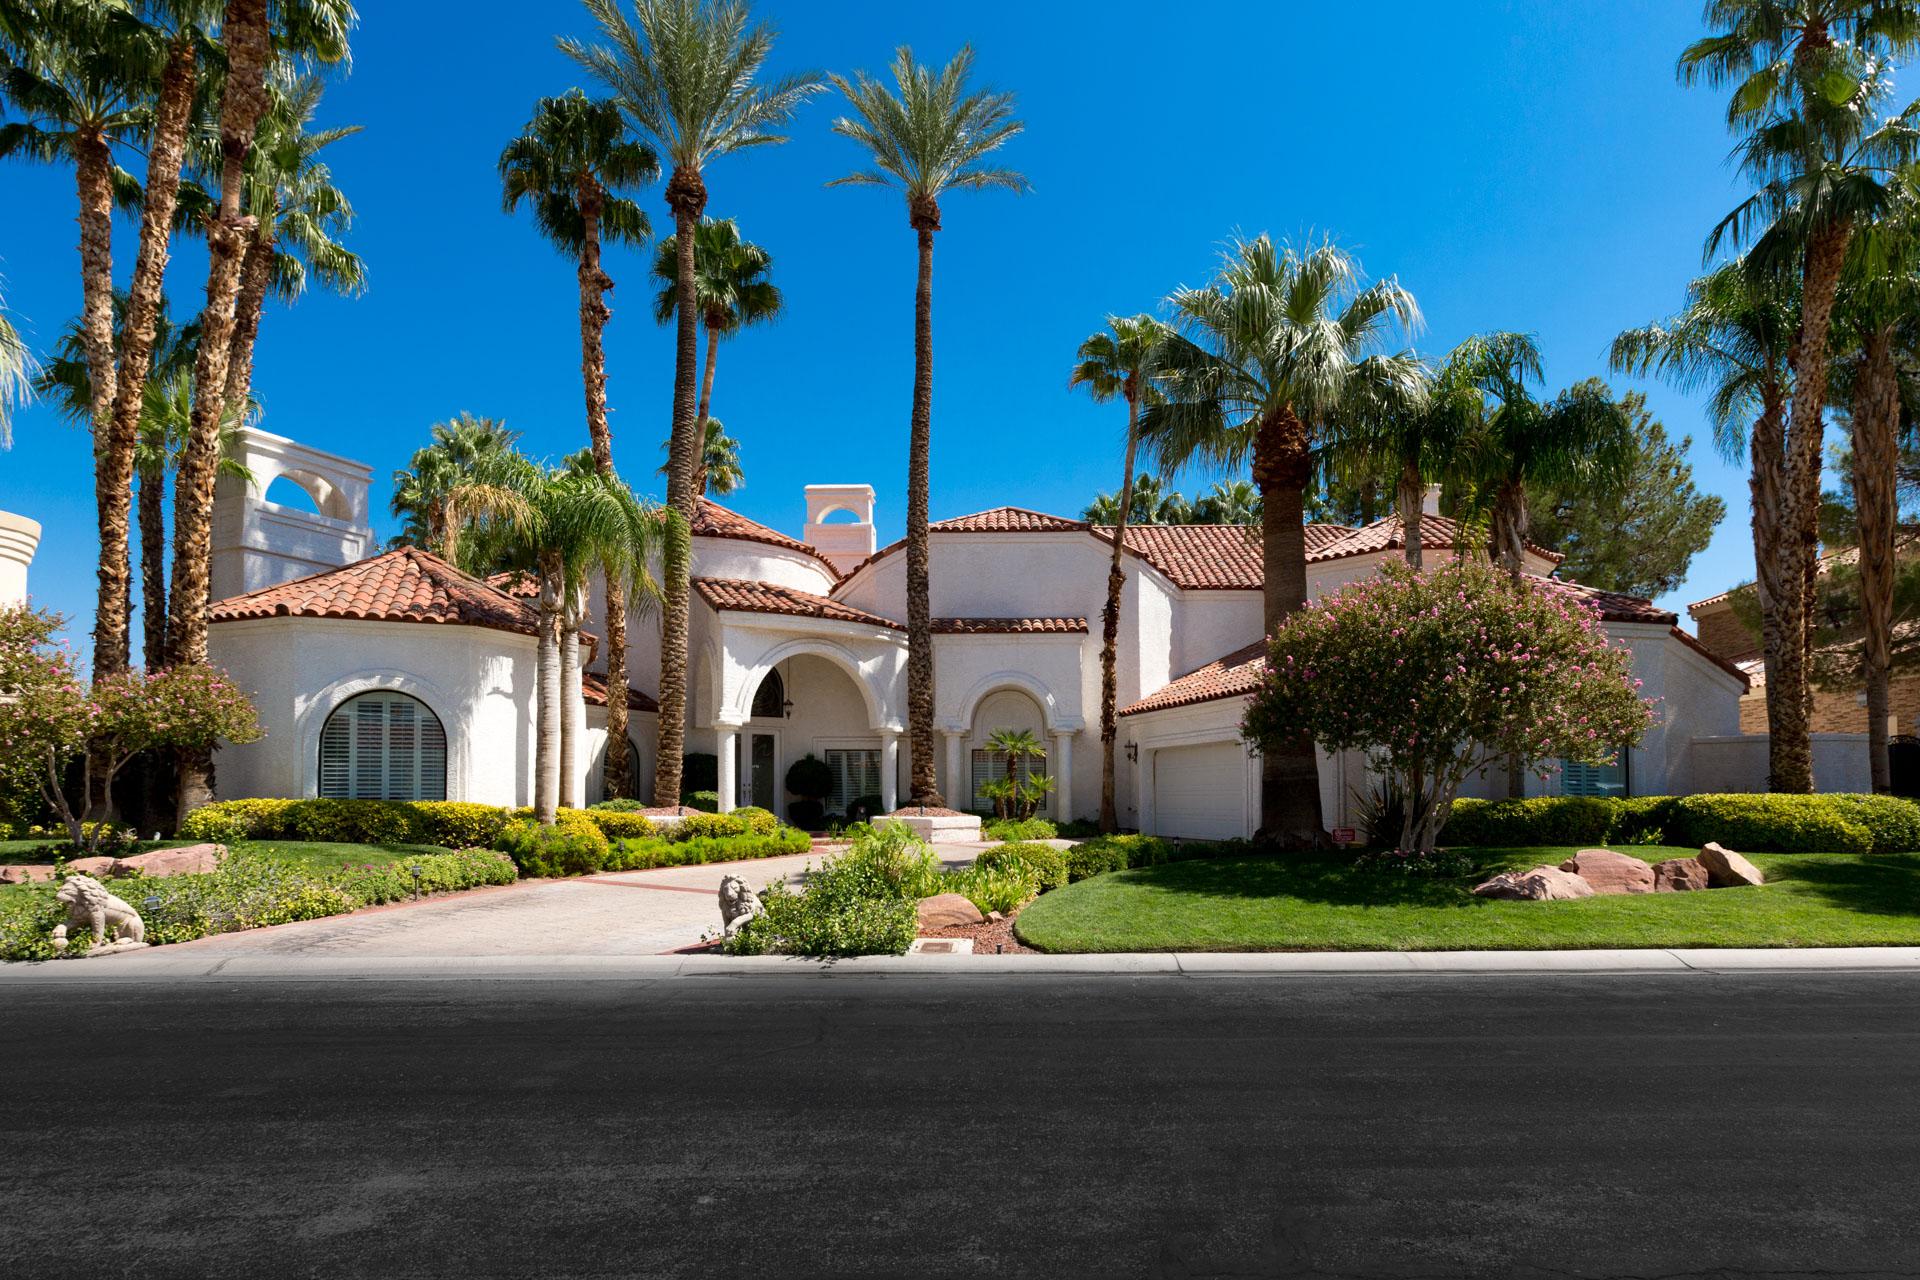 Spanish Trail Las Vegas Homes For Sale